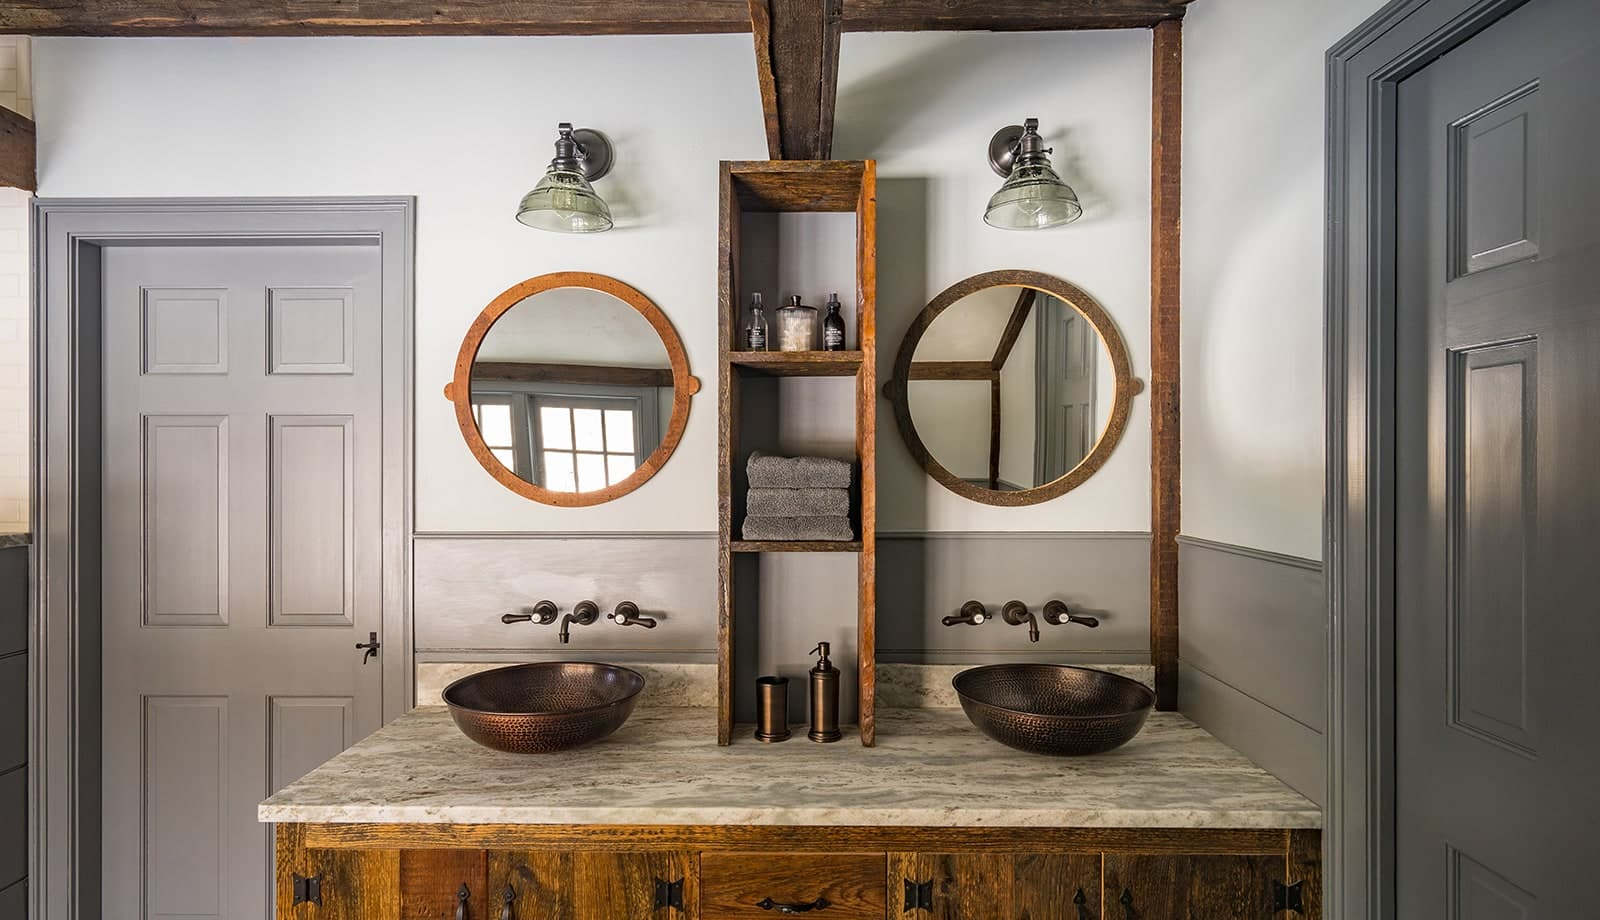 New Hampshire Homestead Historic Interior Bathroom